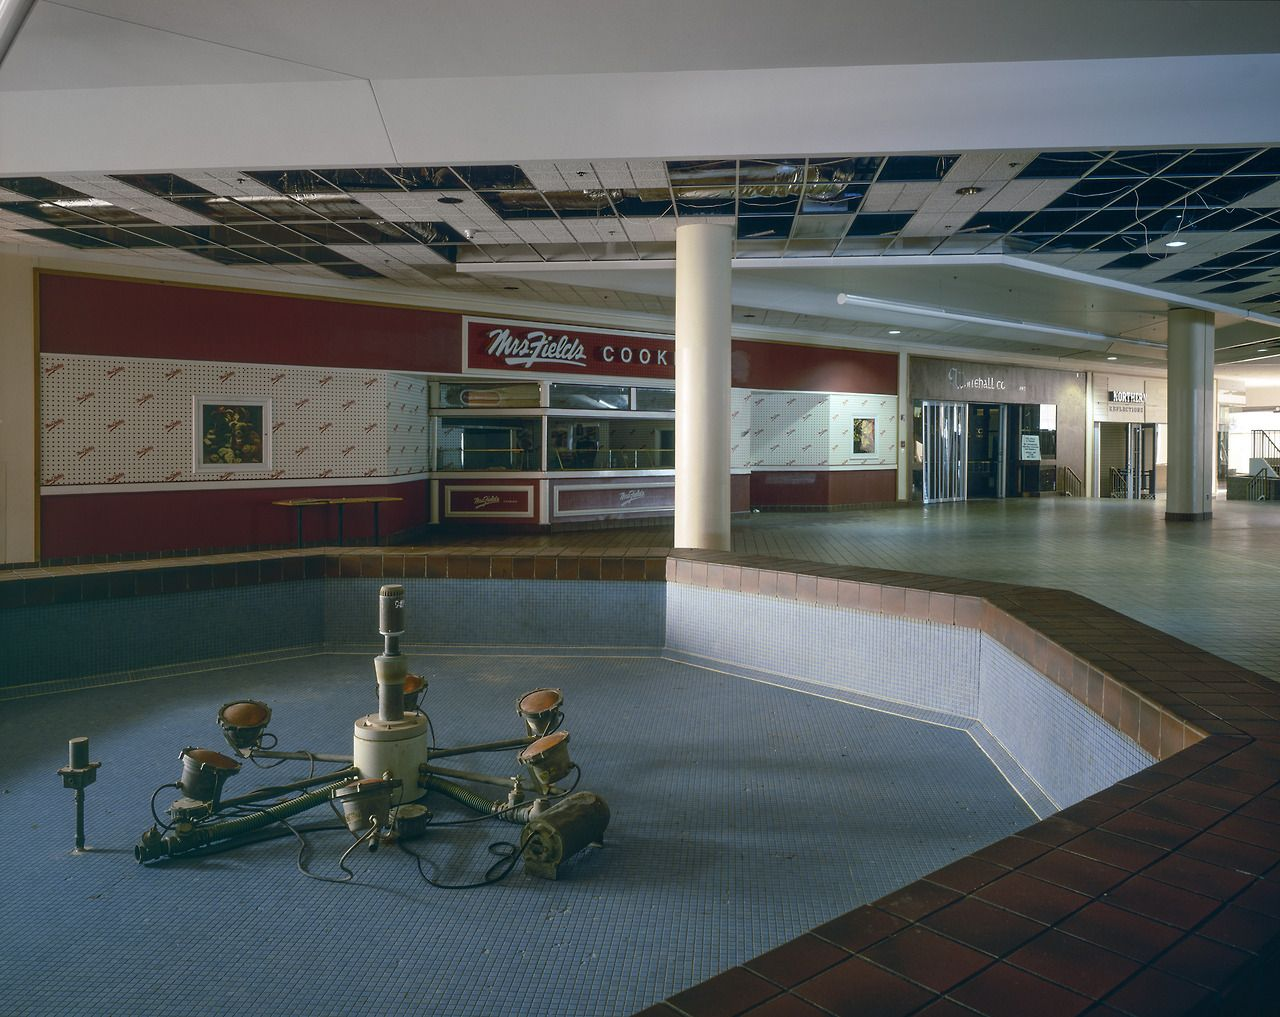 Villa Italia Mall, Lakewood, Colorado Ron Pollard